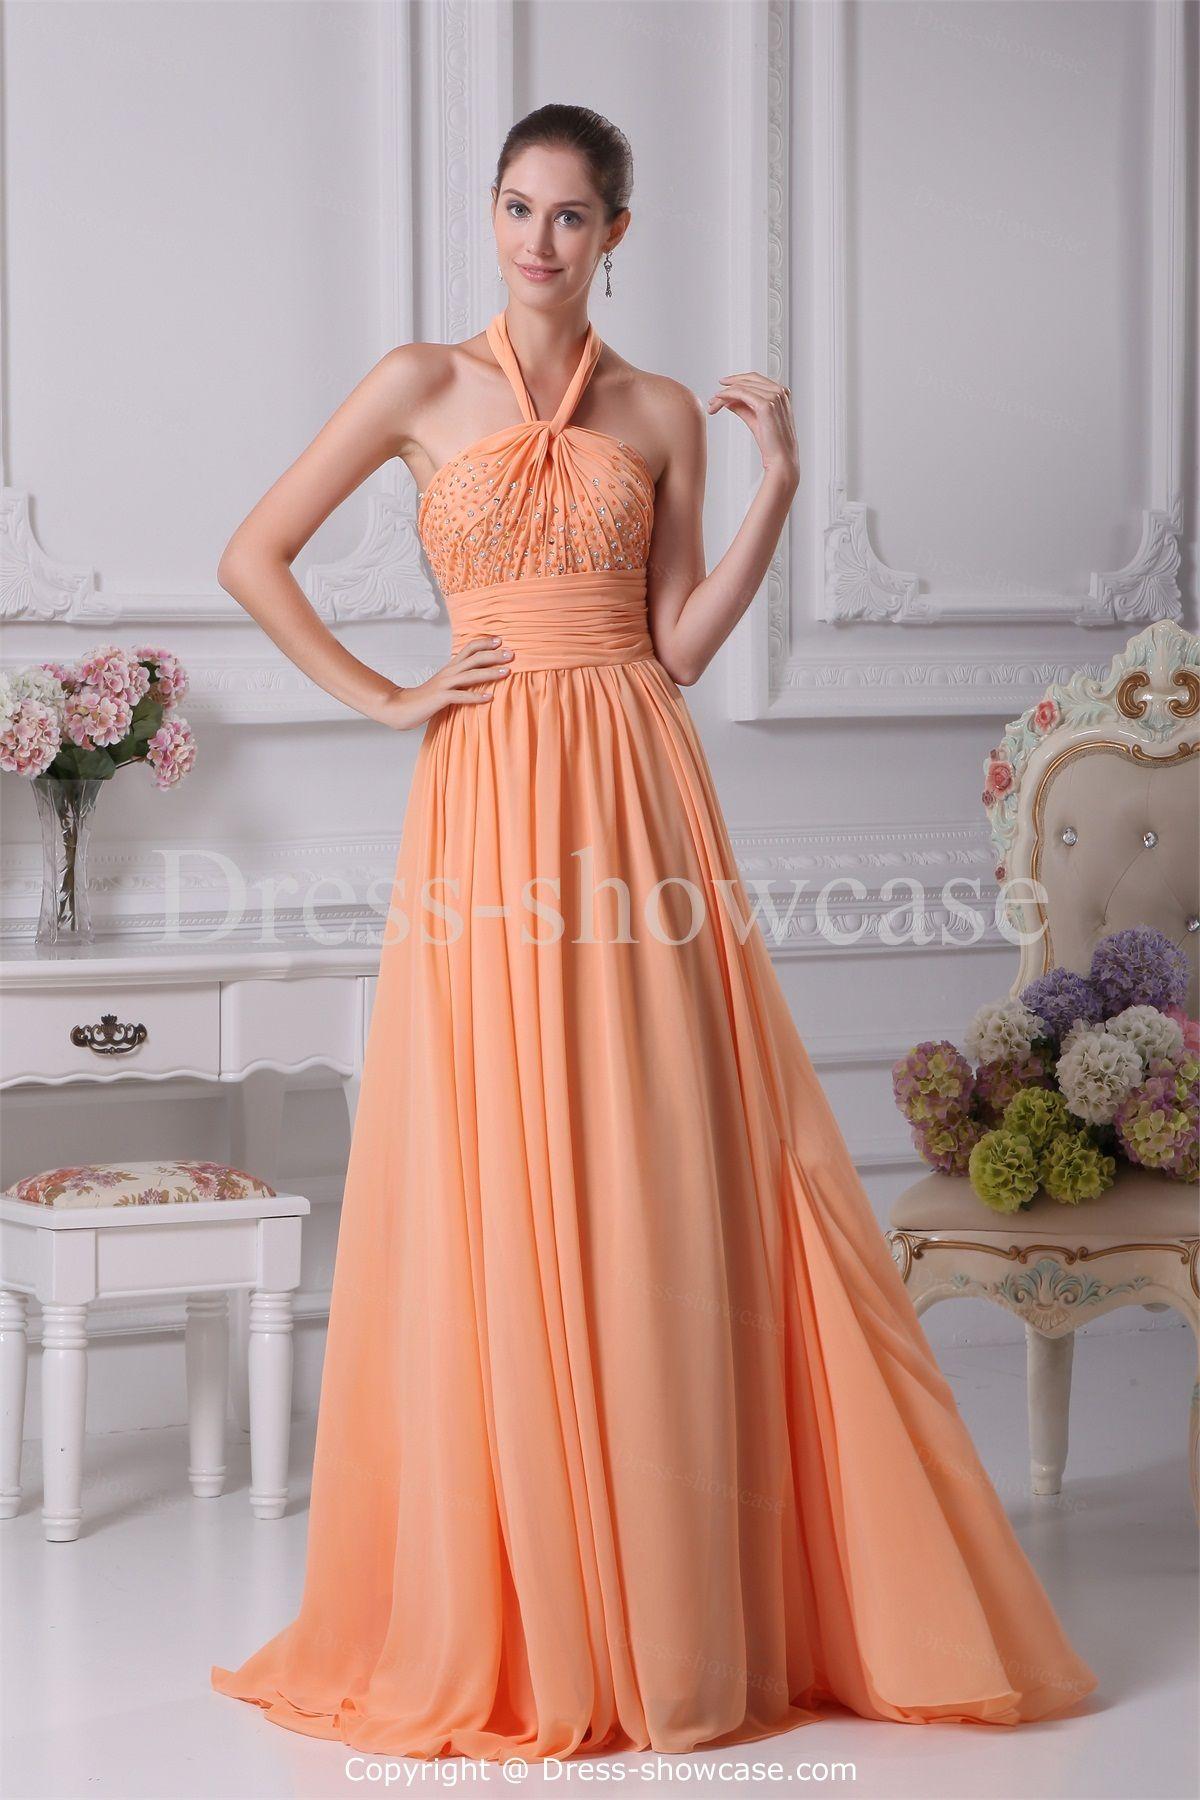 Pink And Orange Bridesmaid Dresses Light Sweep Train Chiffon Dress